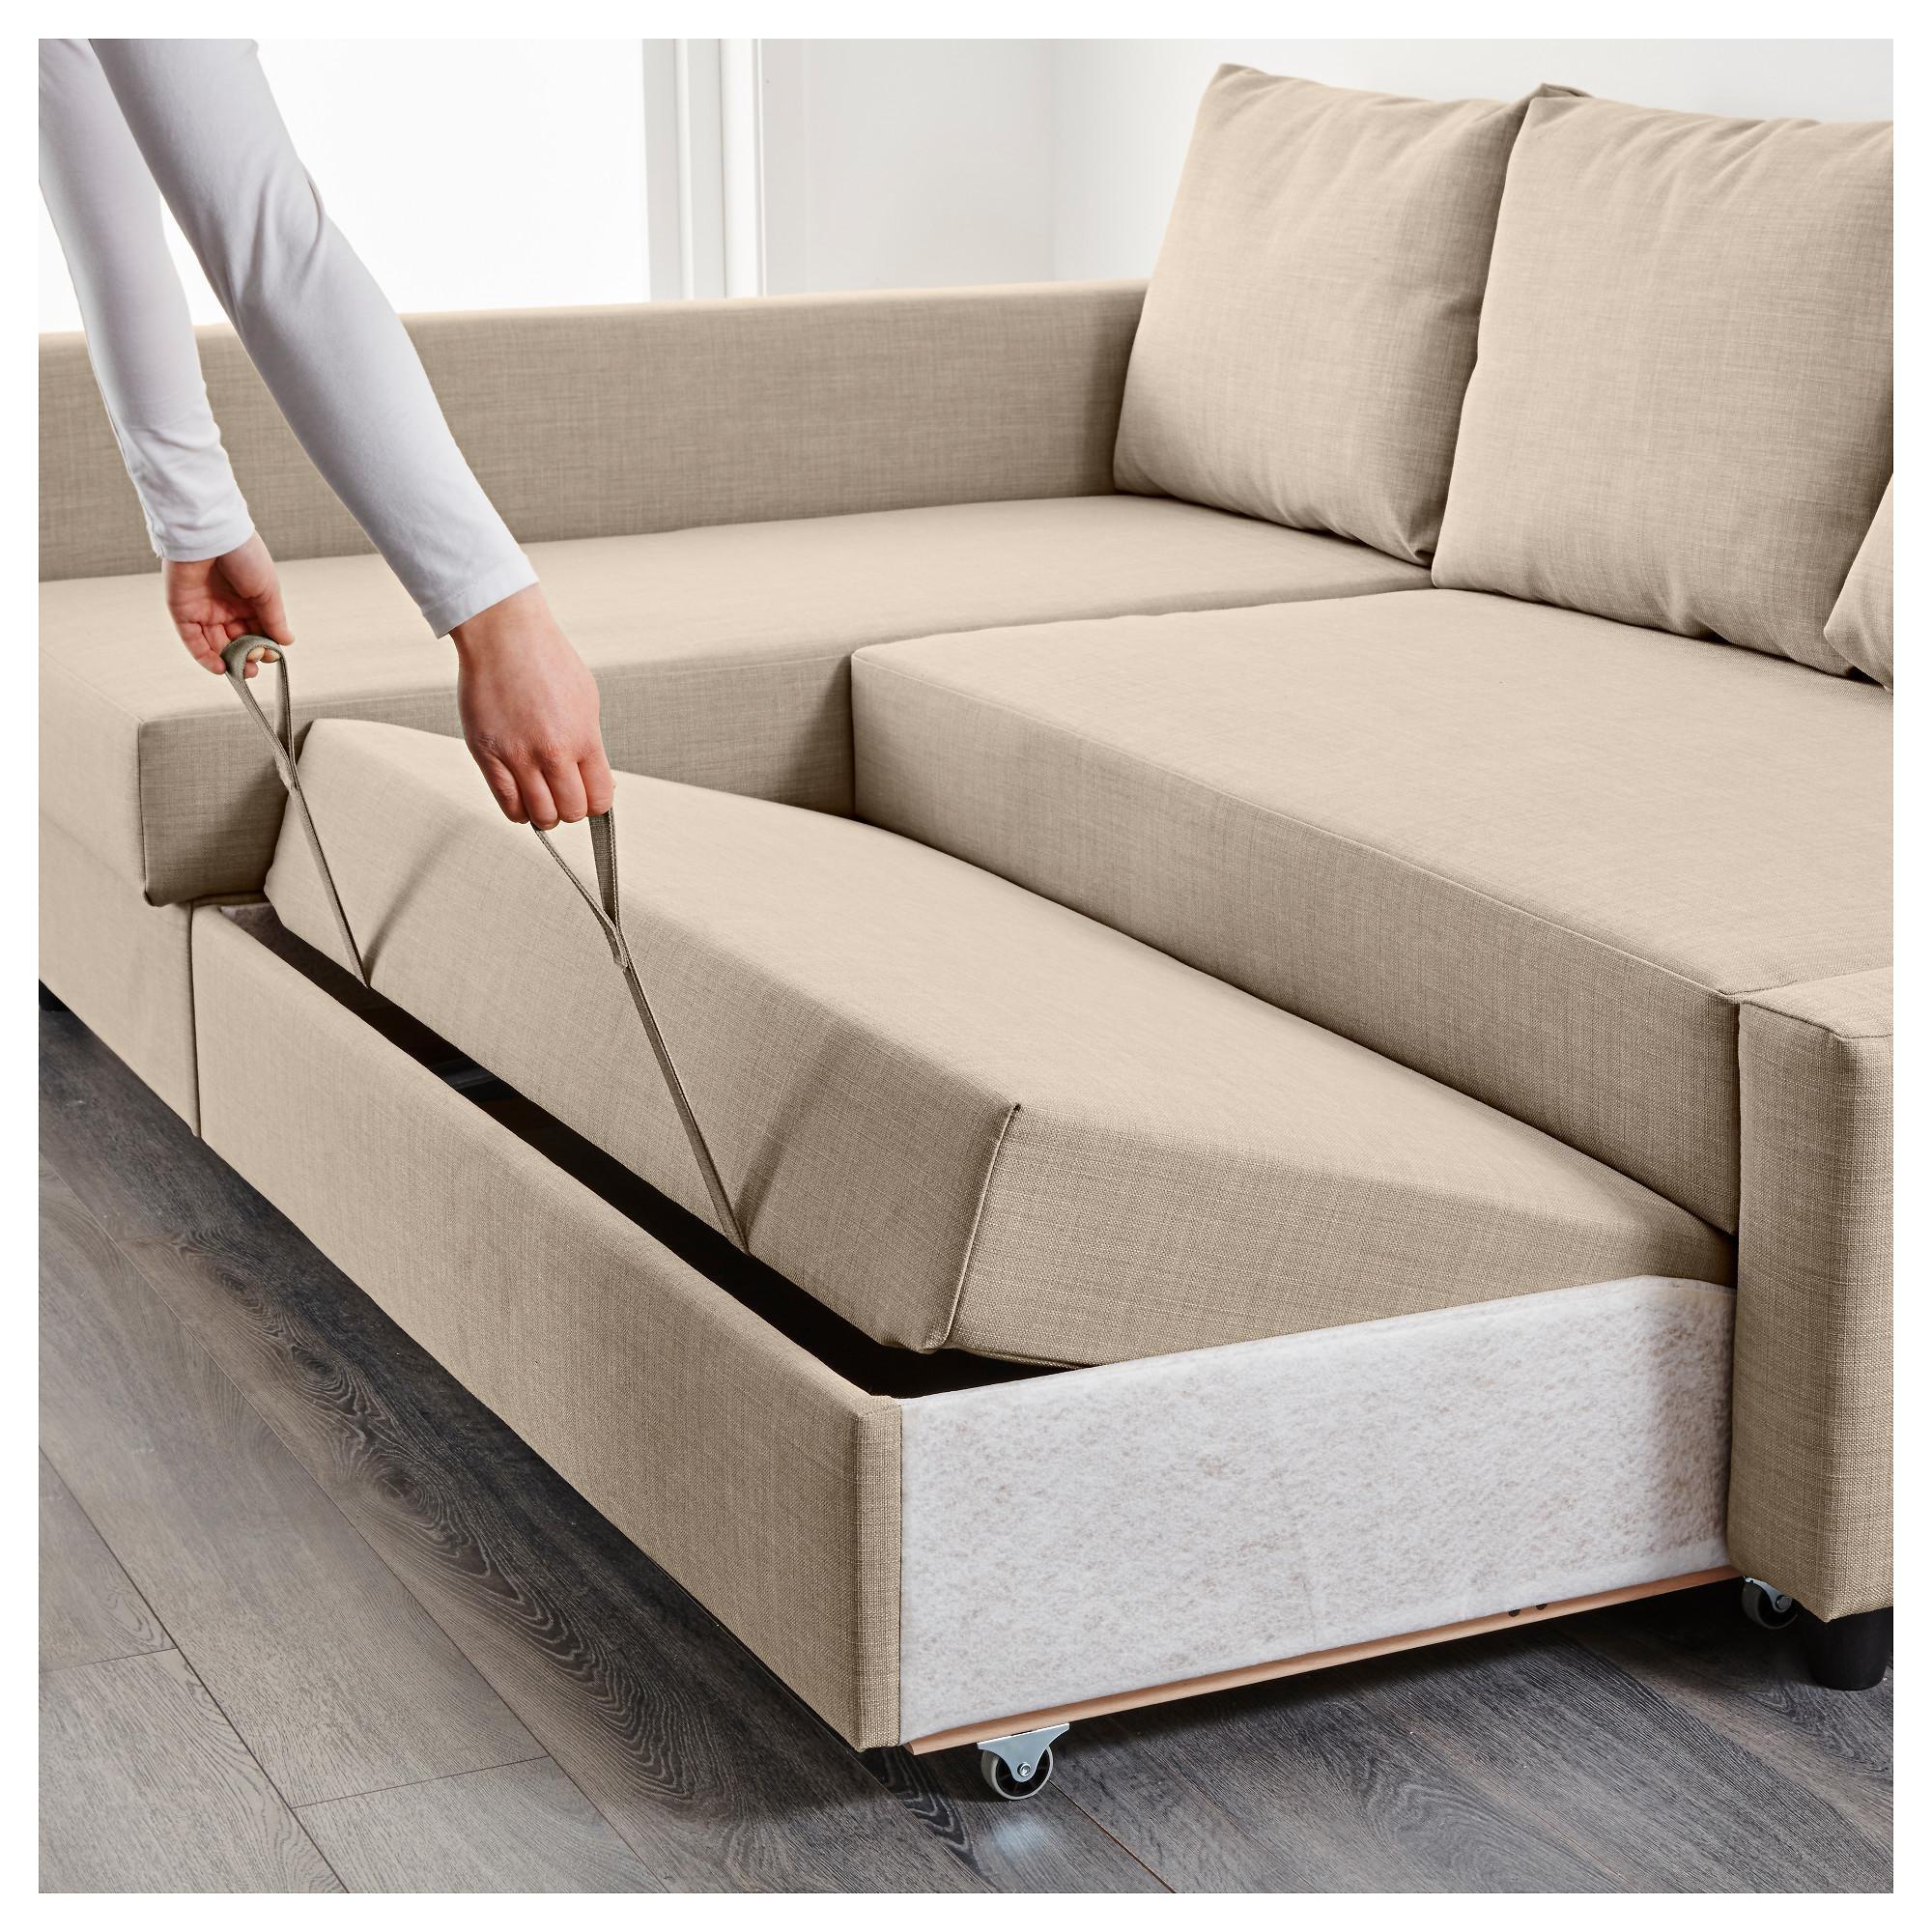 Friheten Corner Sofa Bed With Storage Skiftebo Beige – Ikea For Corner Sofa Bed With Storage Ikea (View 10 of 20)